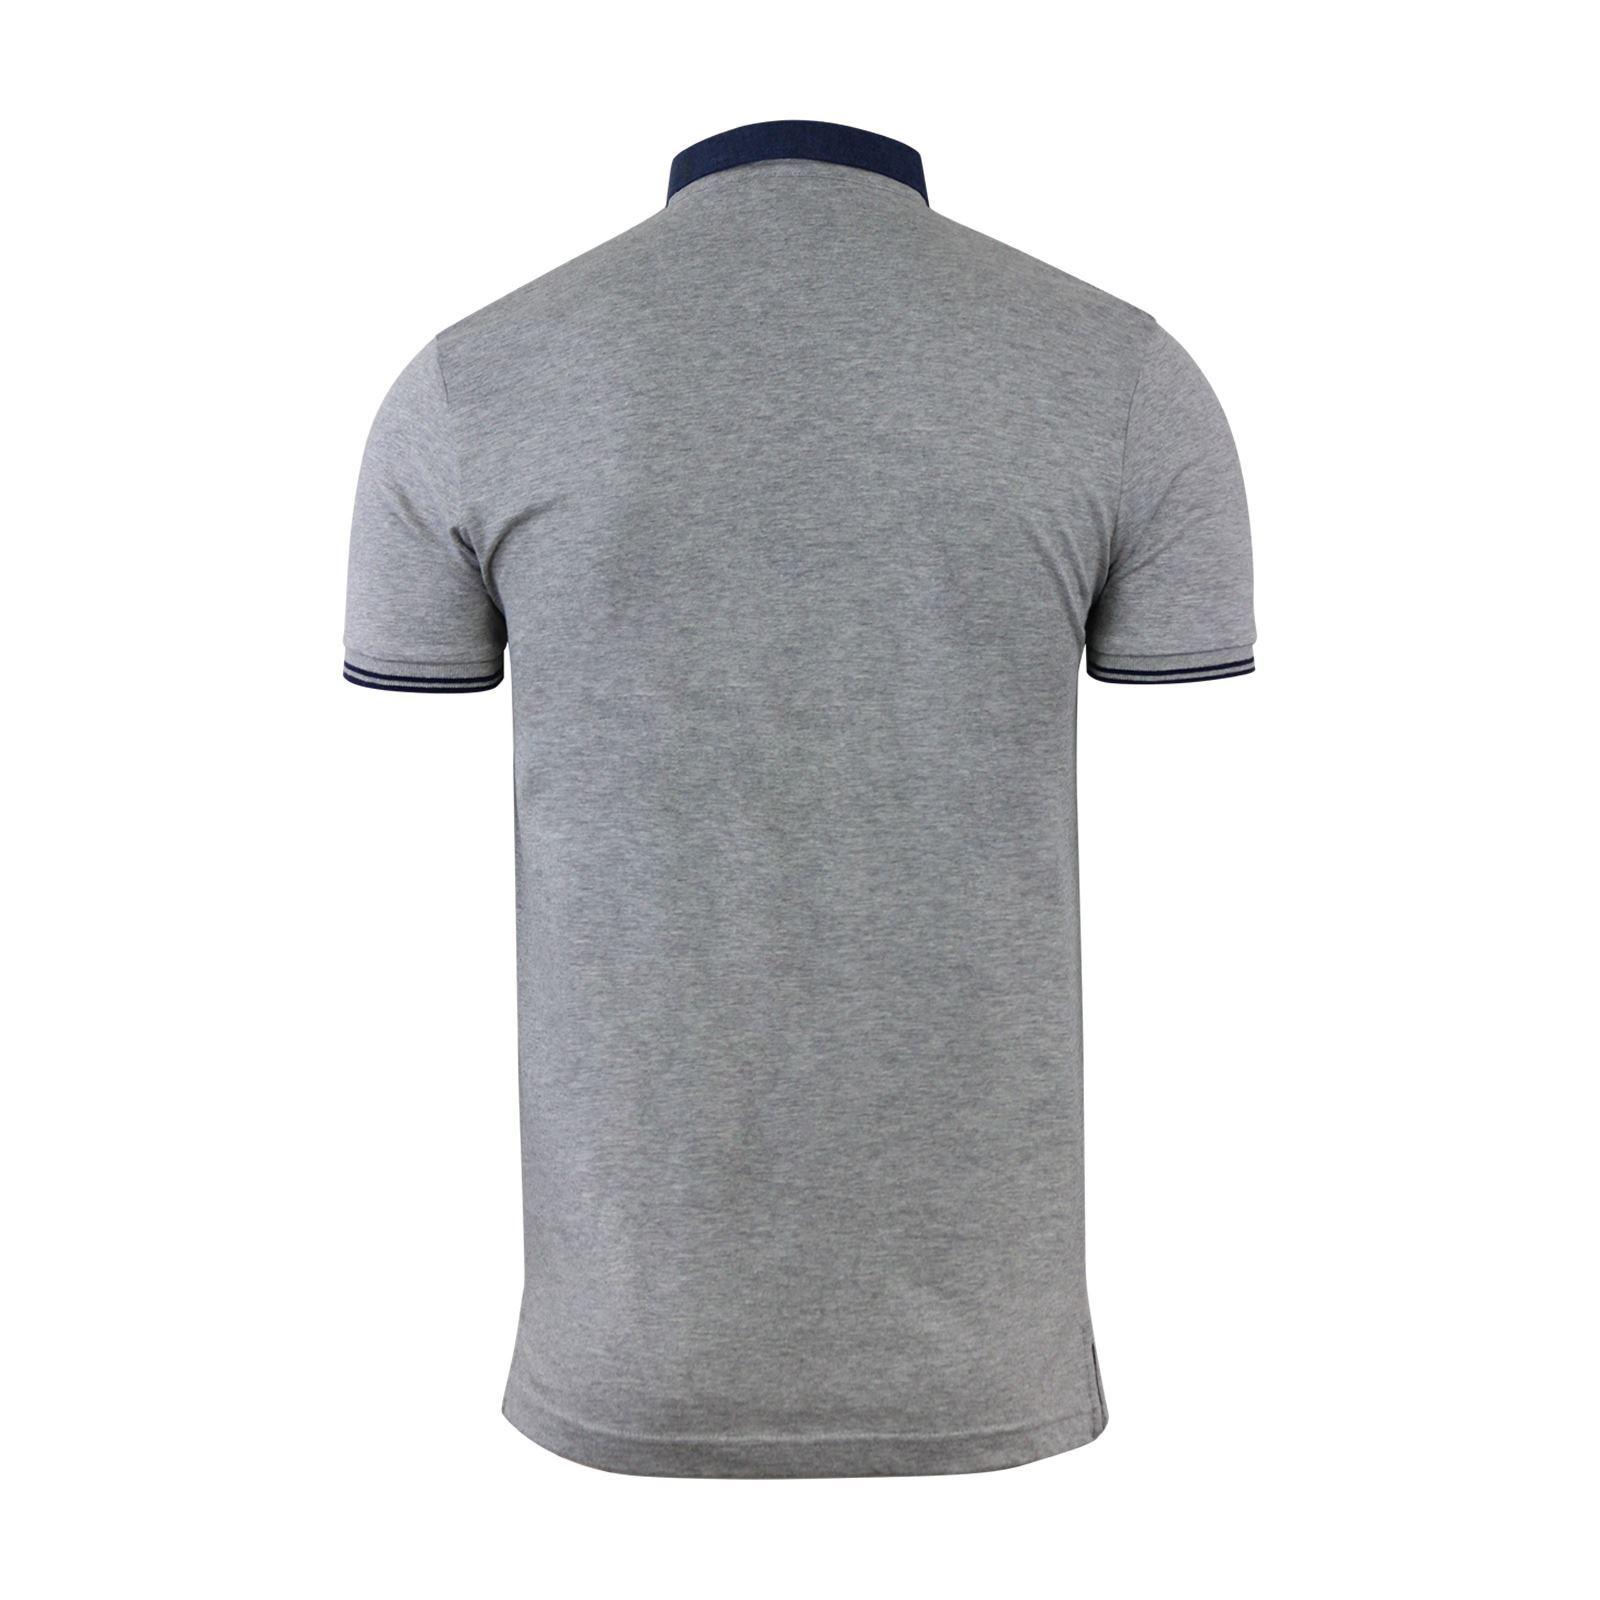 Mens-Polo-T-Shirt-Brave-Soul-Aqua-Printed-Short-Sleeve-Chambray-Collar-Top thumbnail 6